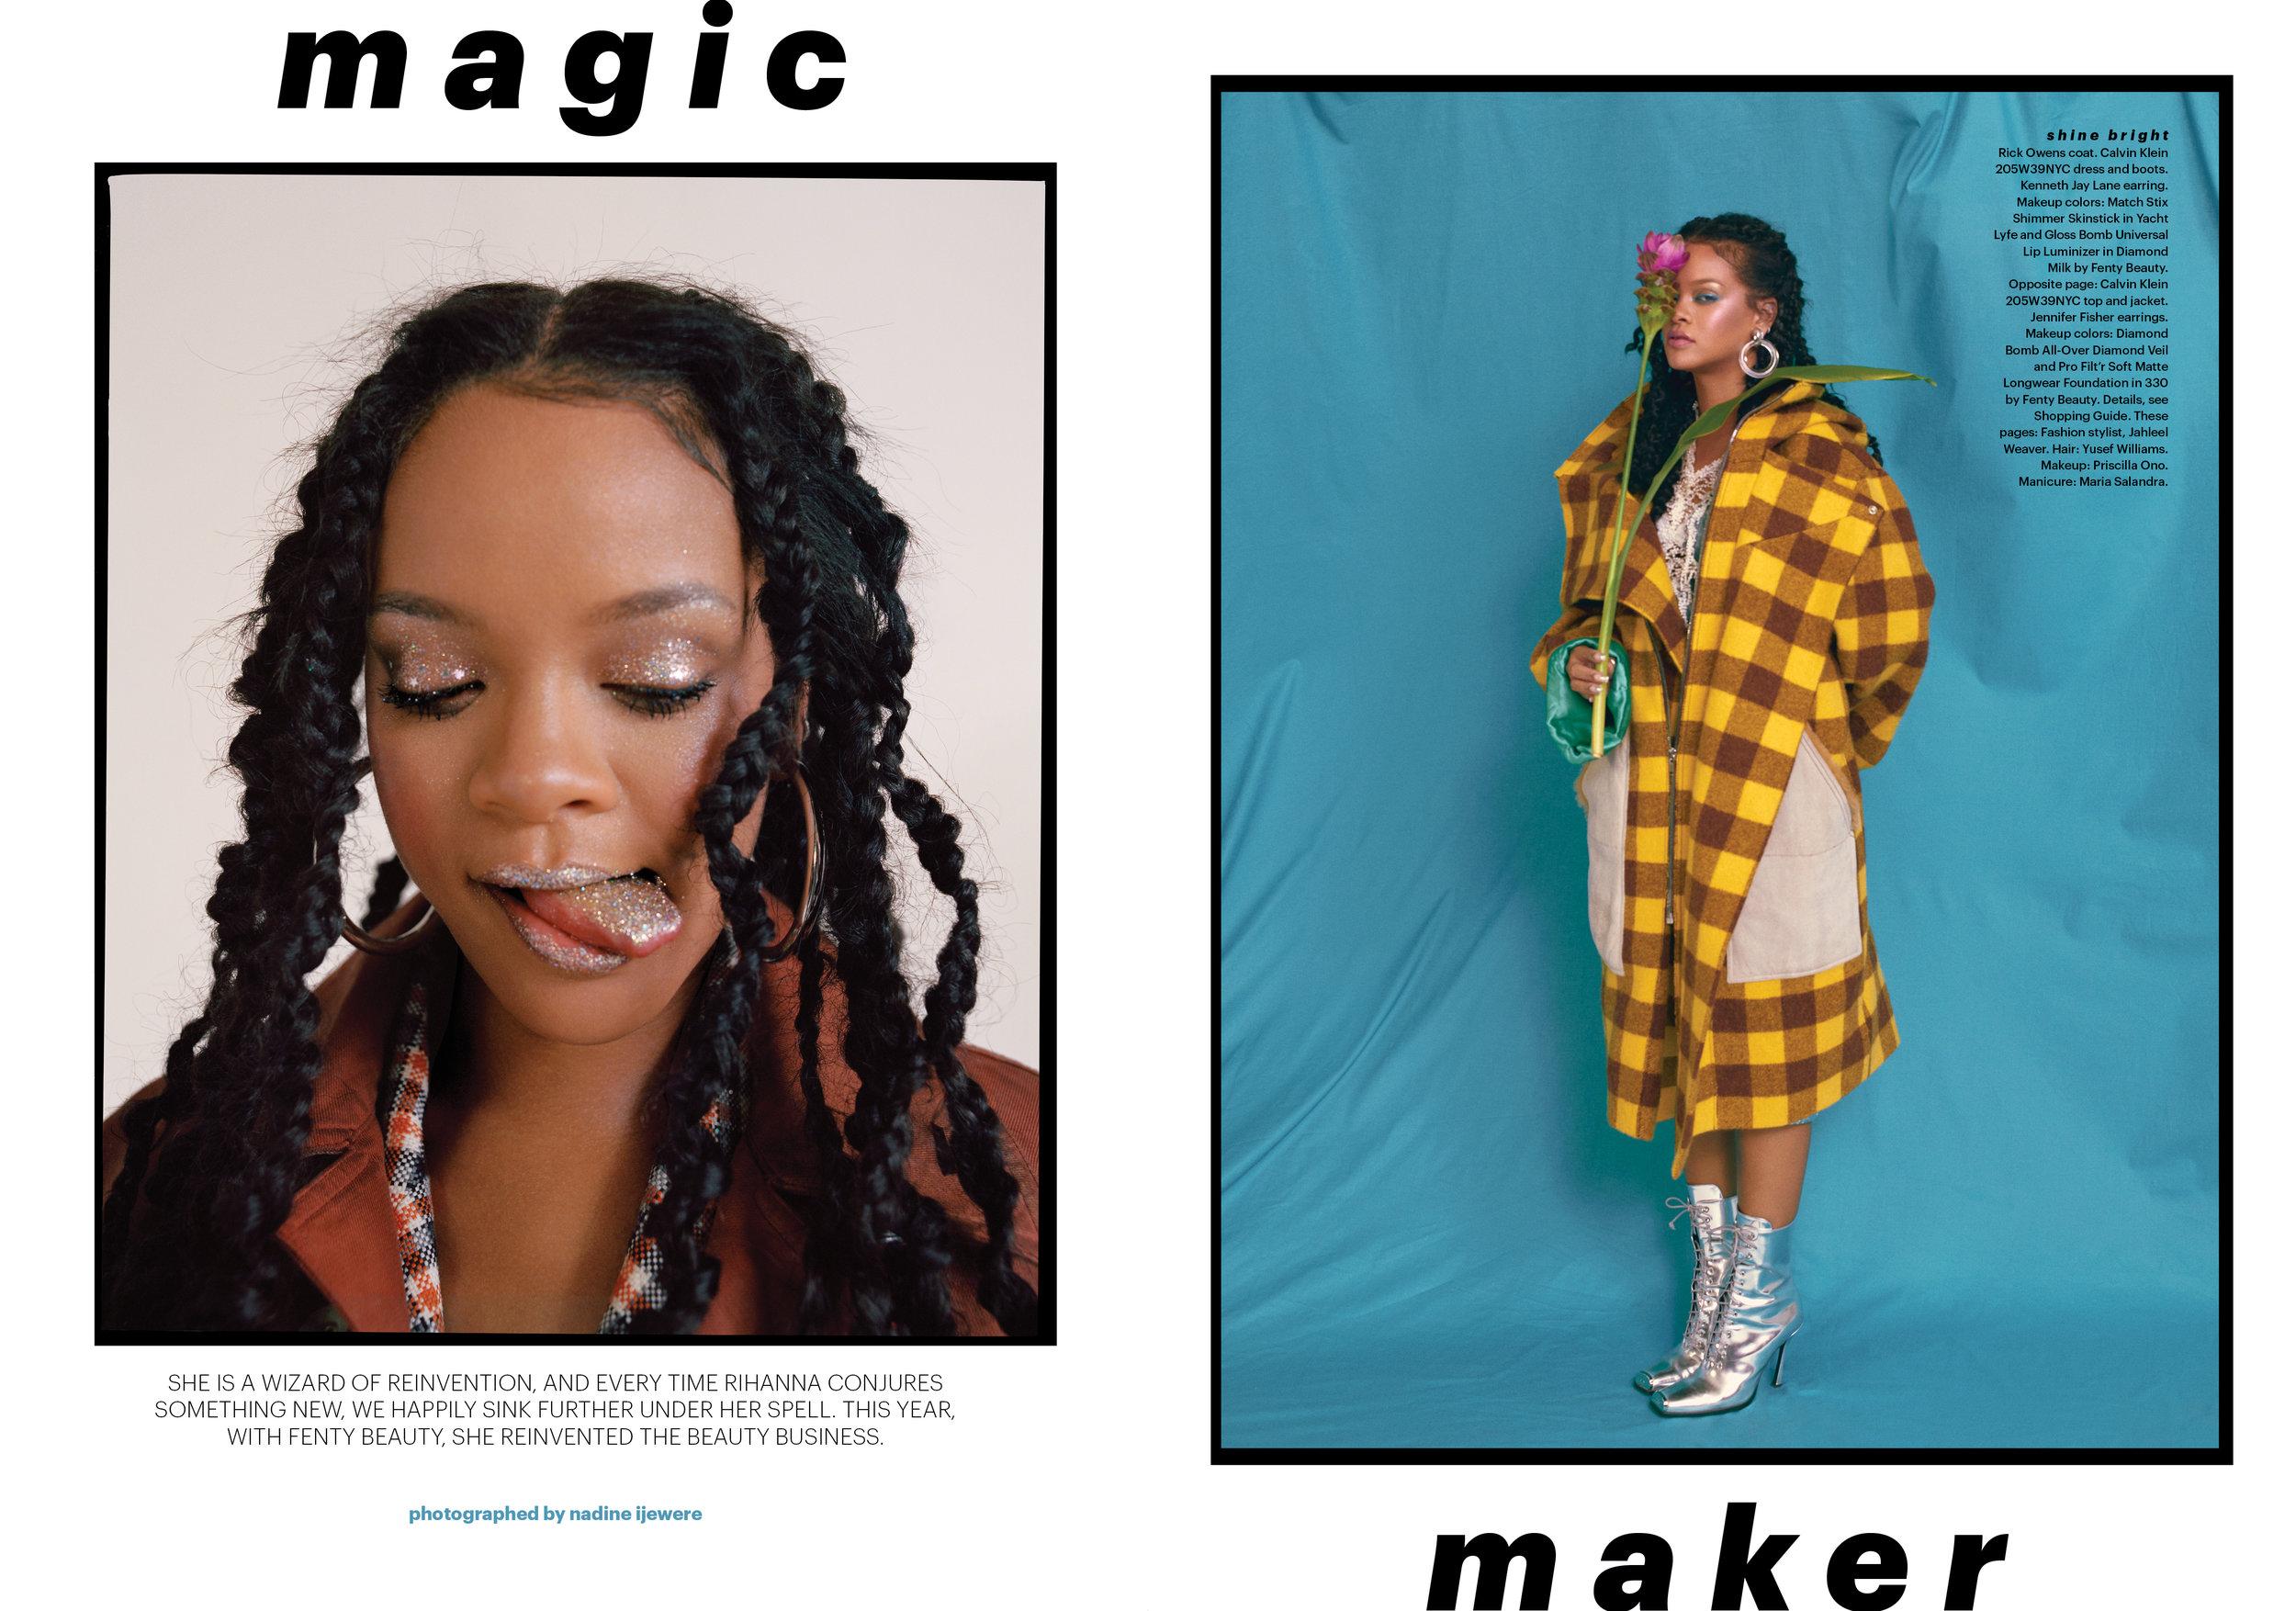 AL100118Profile_Rihanna_lo_20274428;59_View.jpg